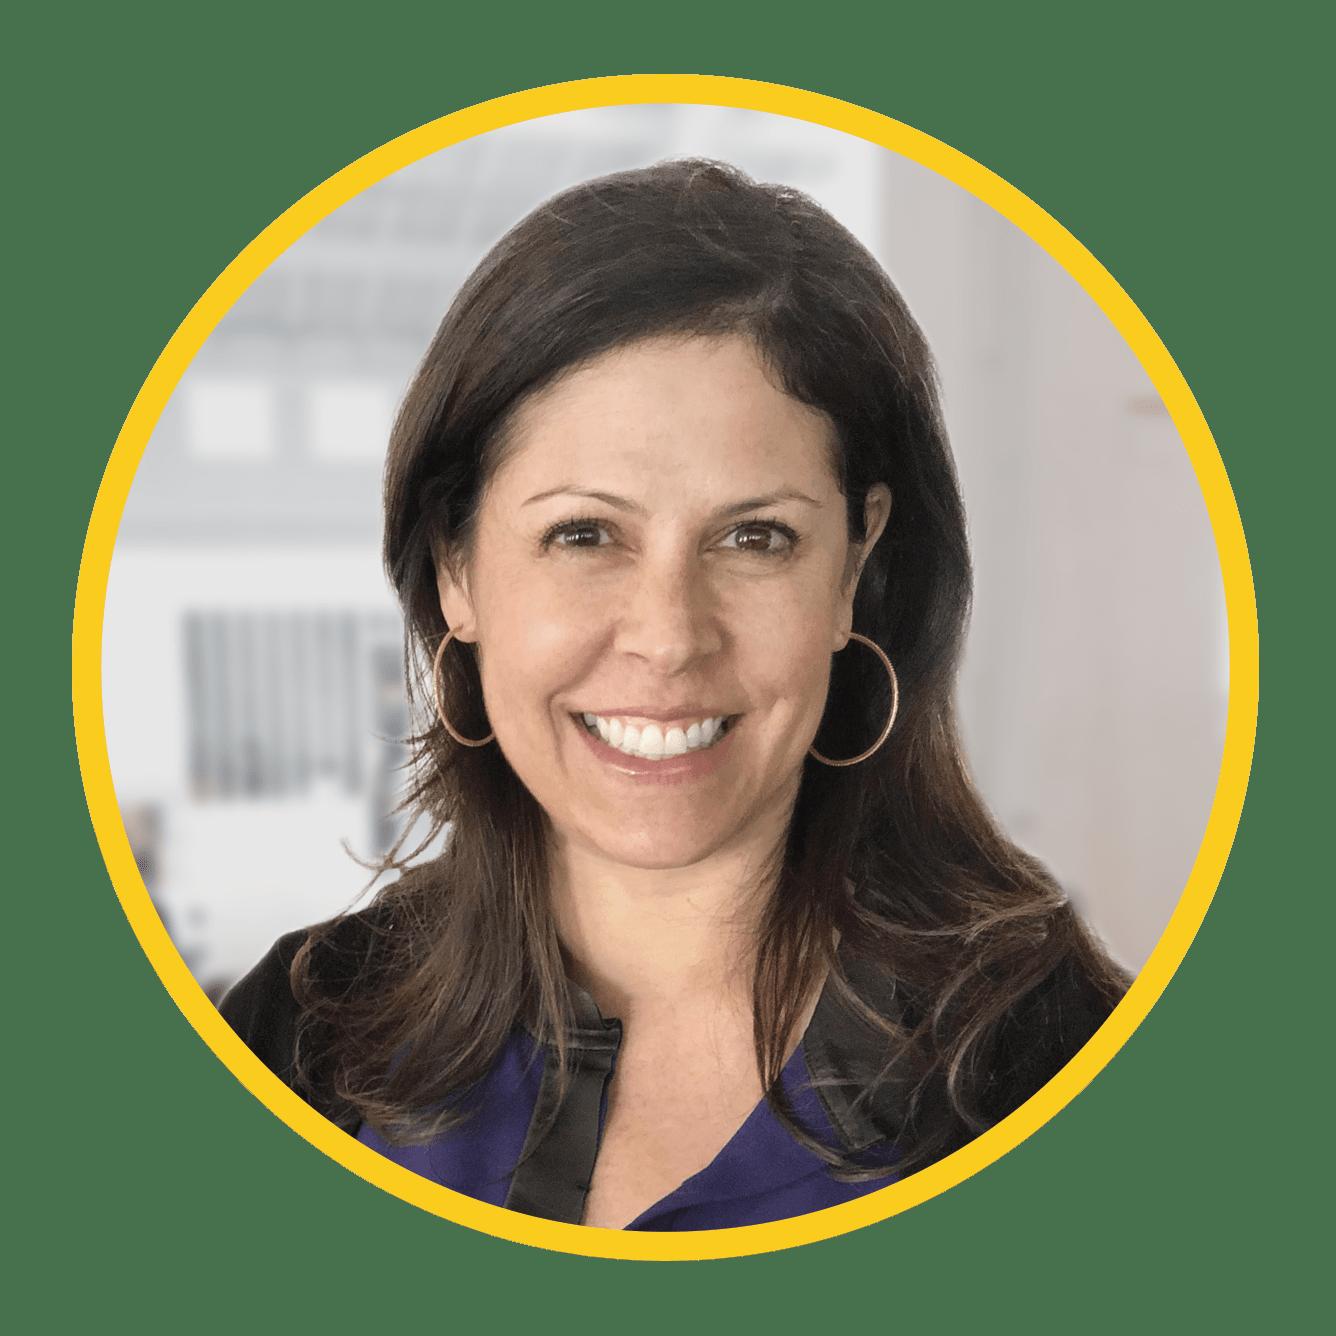 Hilary Laffer - COMMUNICATION, MARKETING, & DESIGN STRATEGIST